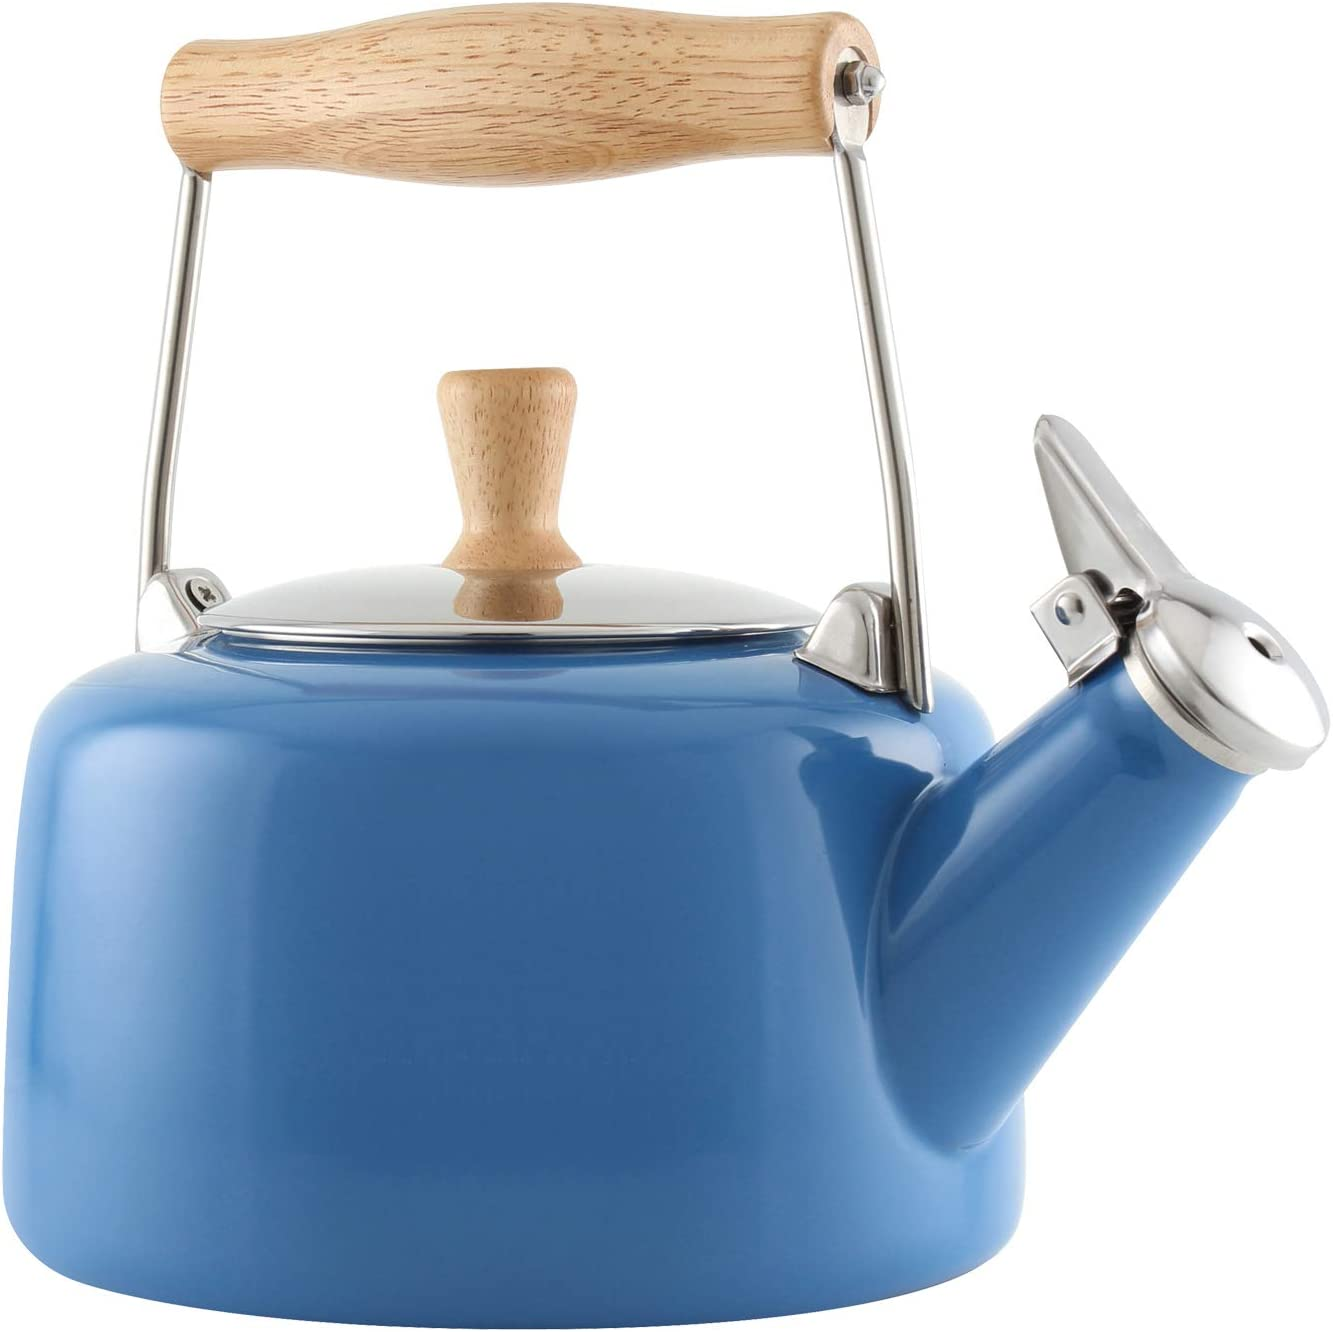 1.4 quarts Blue Cove Chantal Sven Enamel on Steel Whistling Teakettle